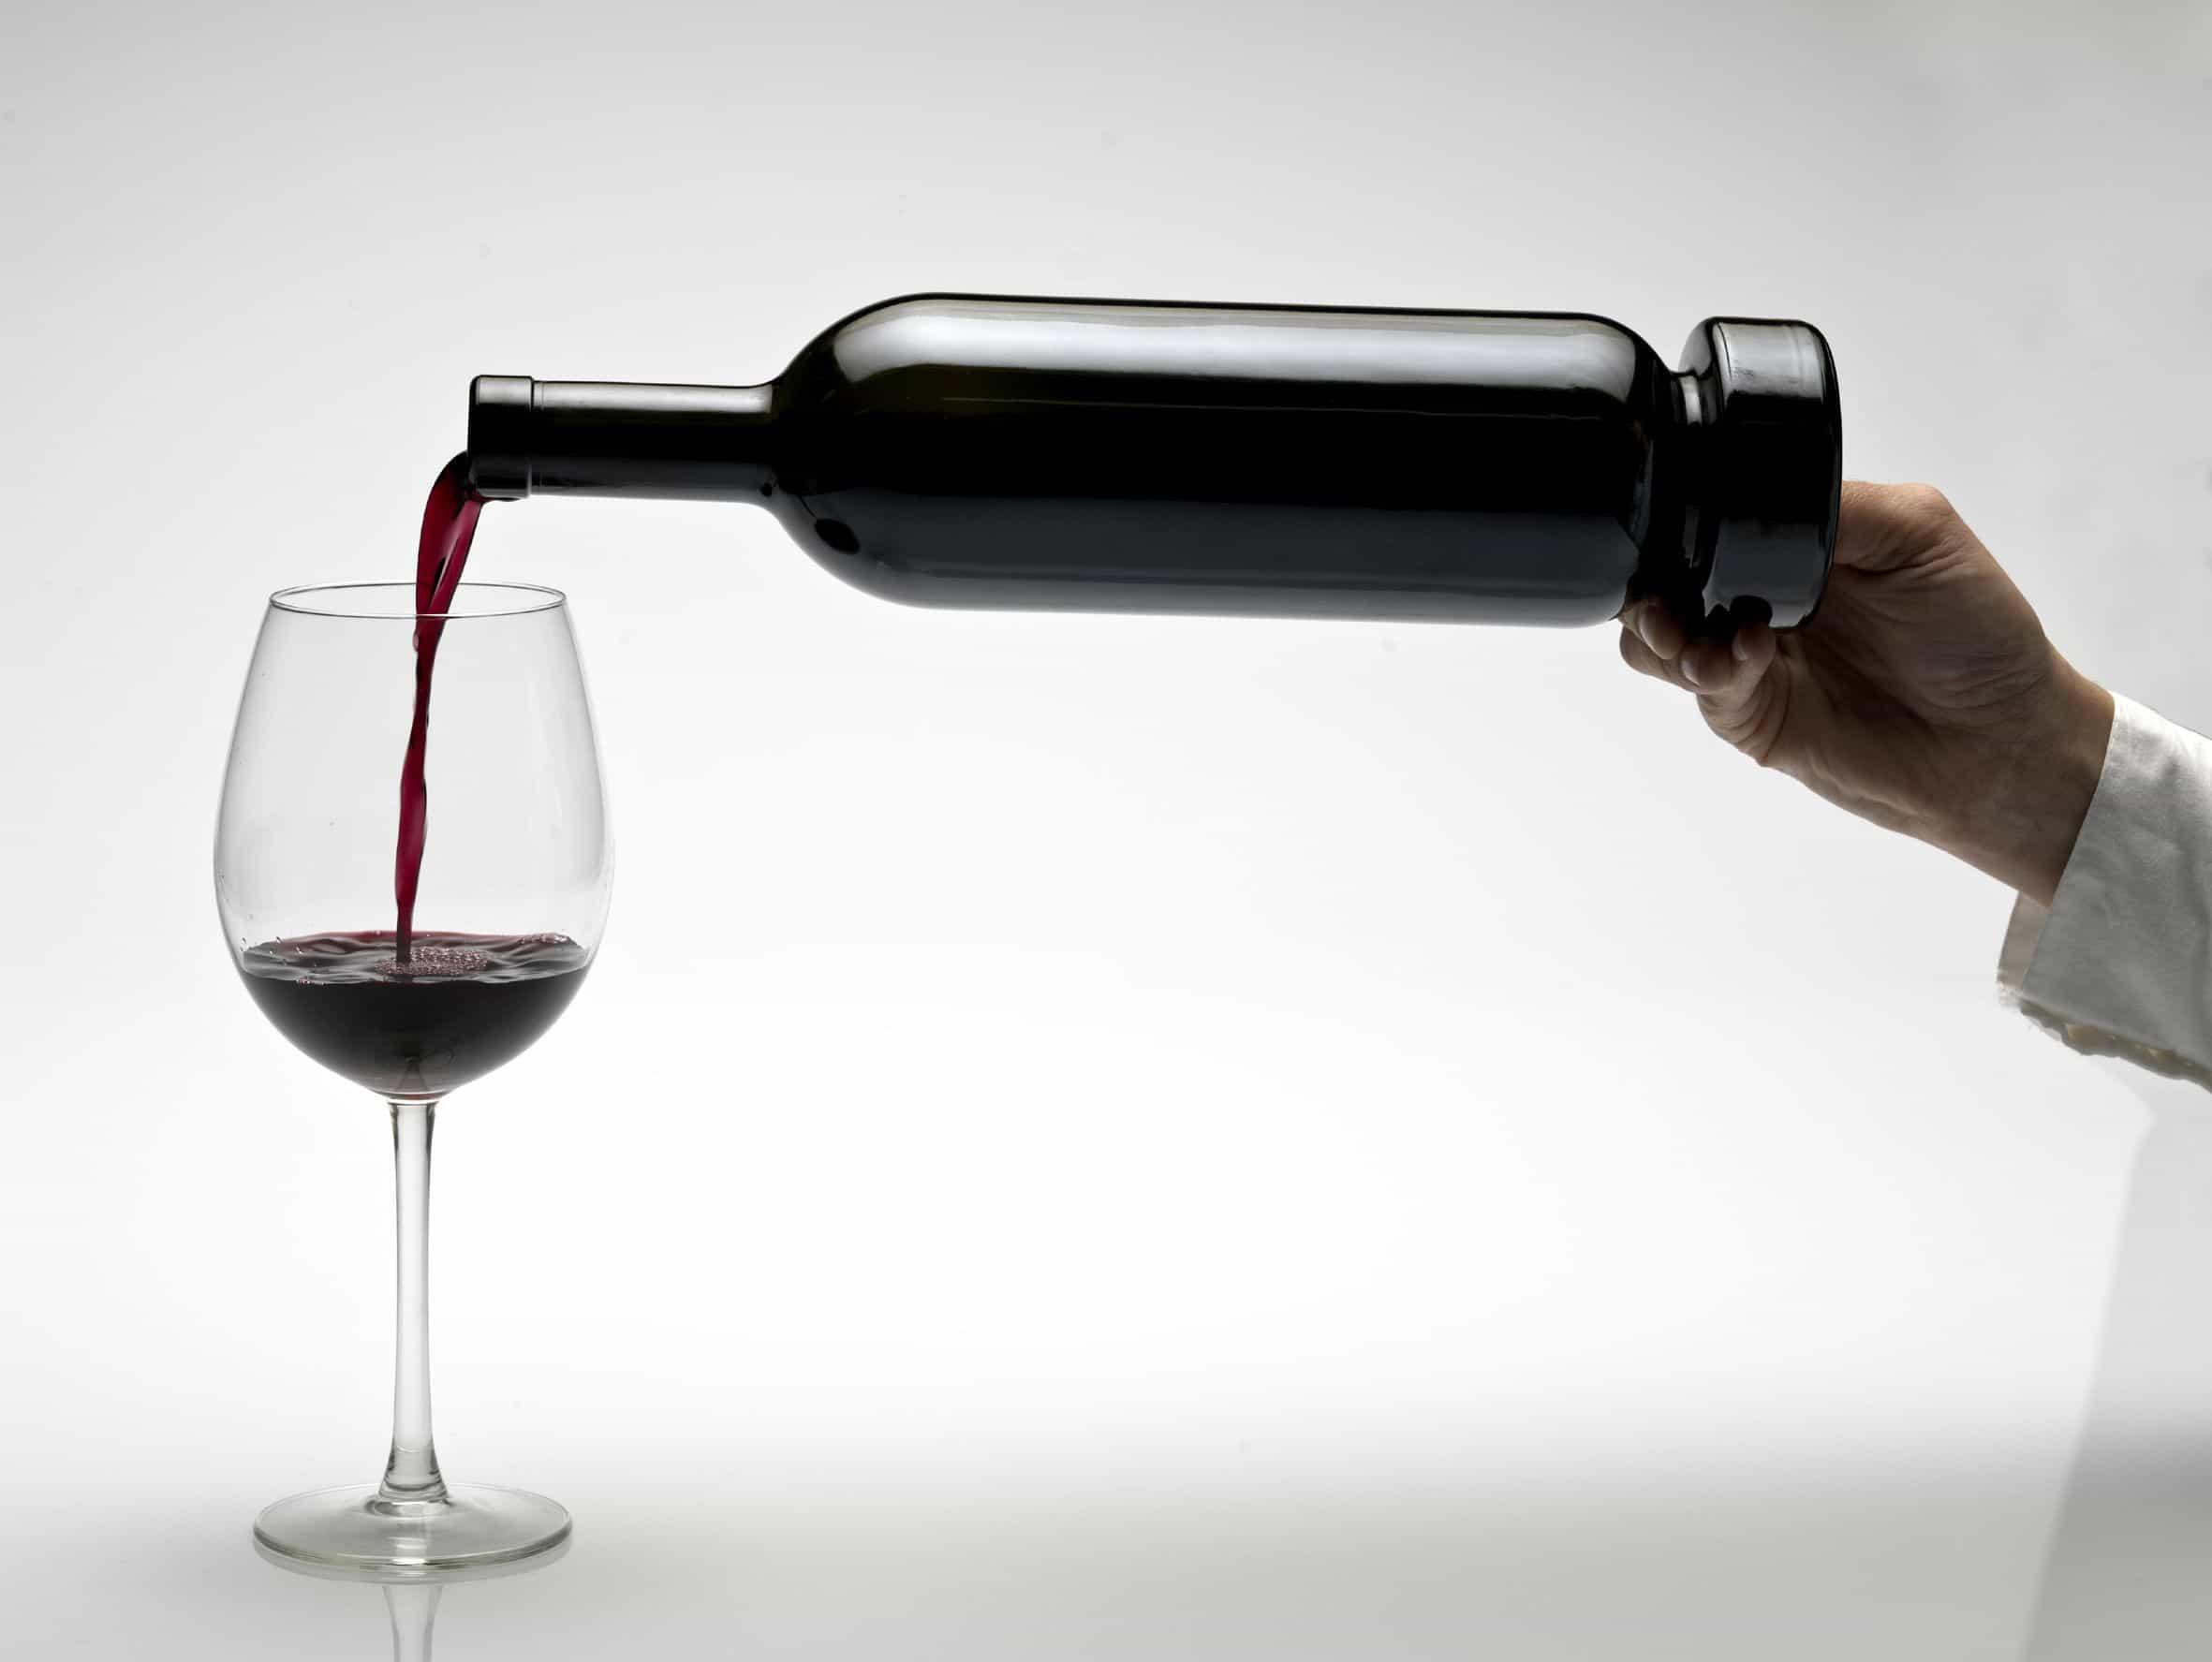 Características regionais destacam vinhos portugueses em Dusseldord